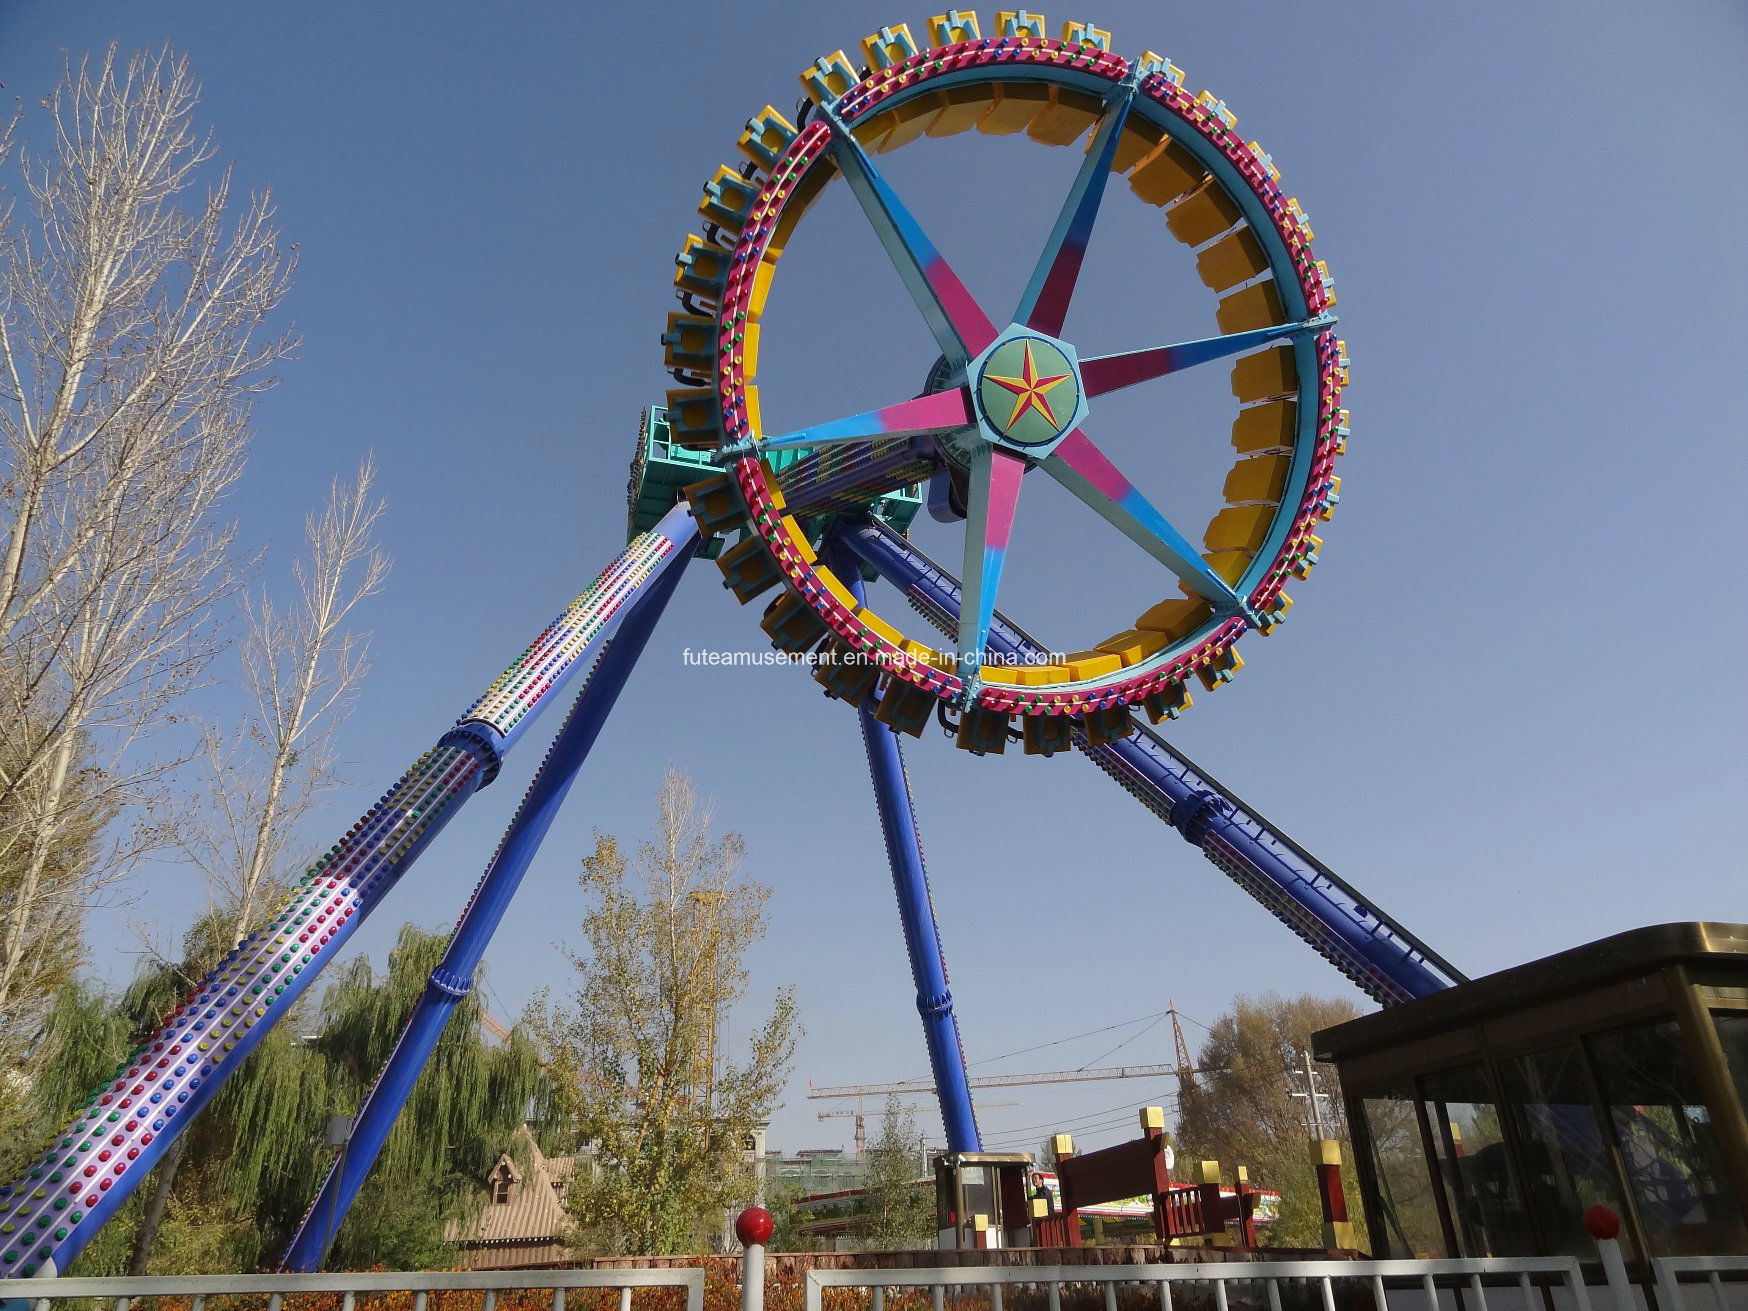 Amazing Amusement Park Electric Swing Amusement Rides Big Pendulum for Sale|Outdoor Big Pendulum